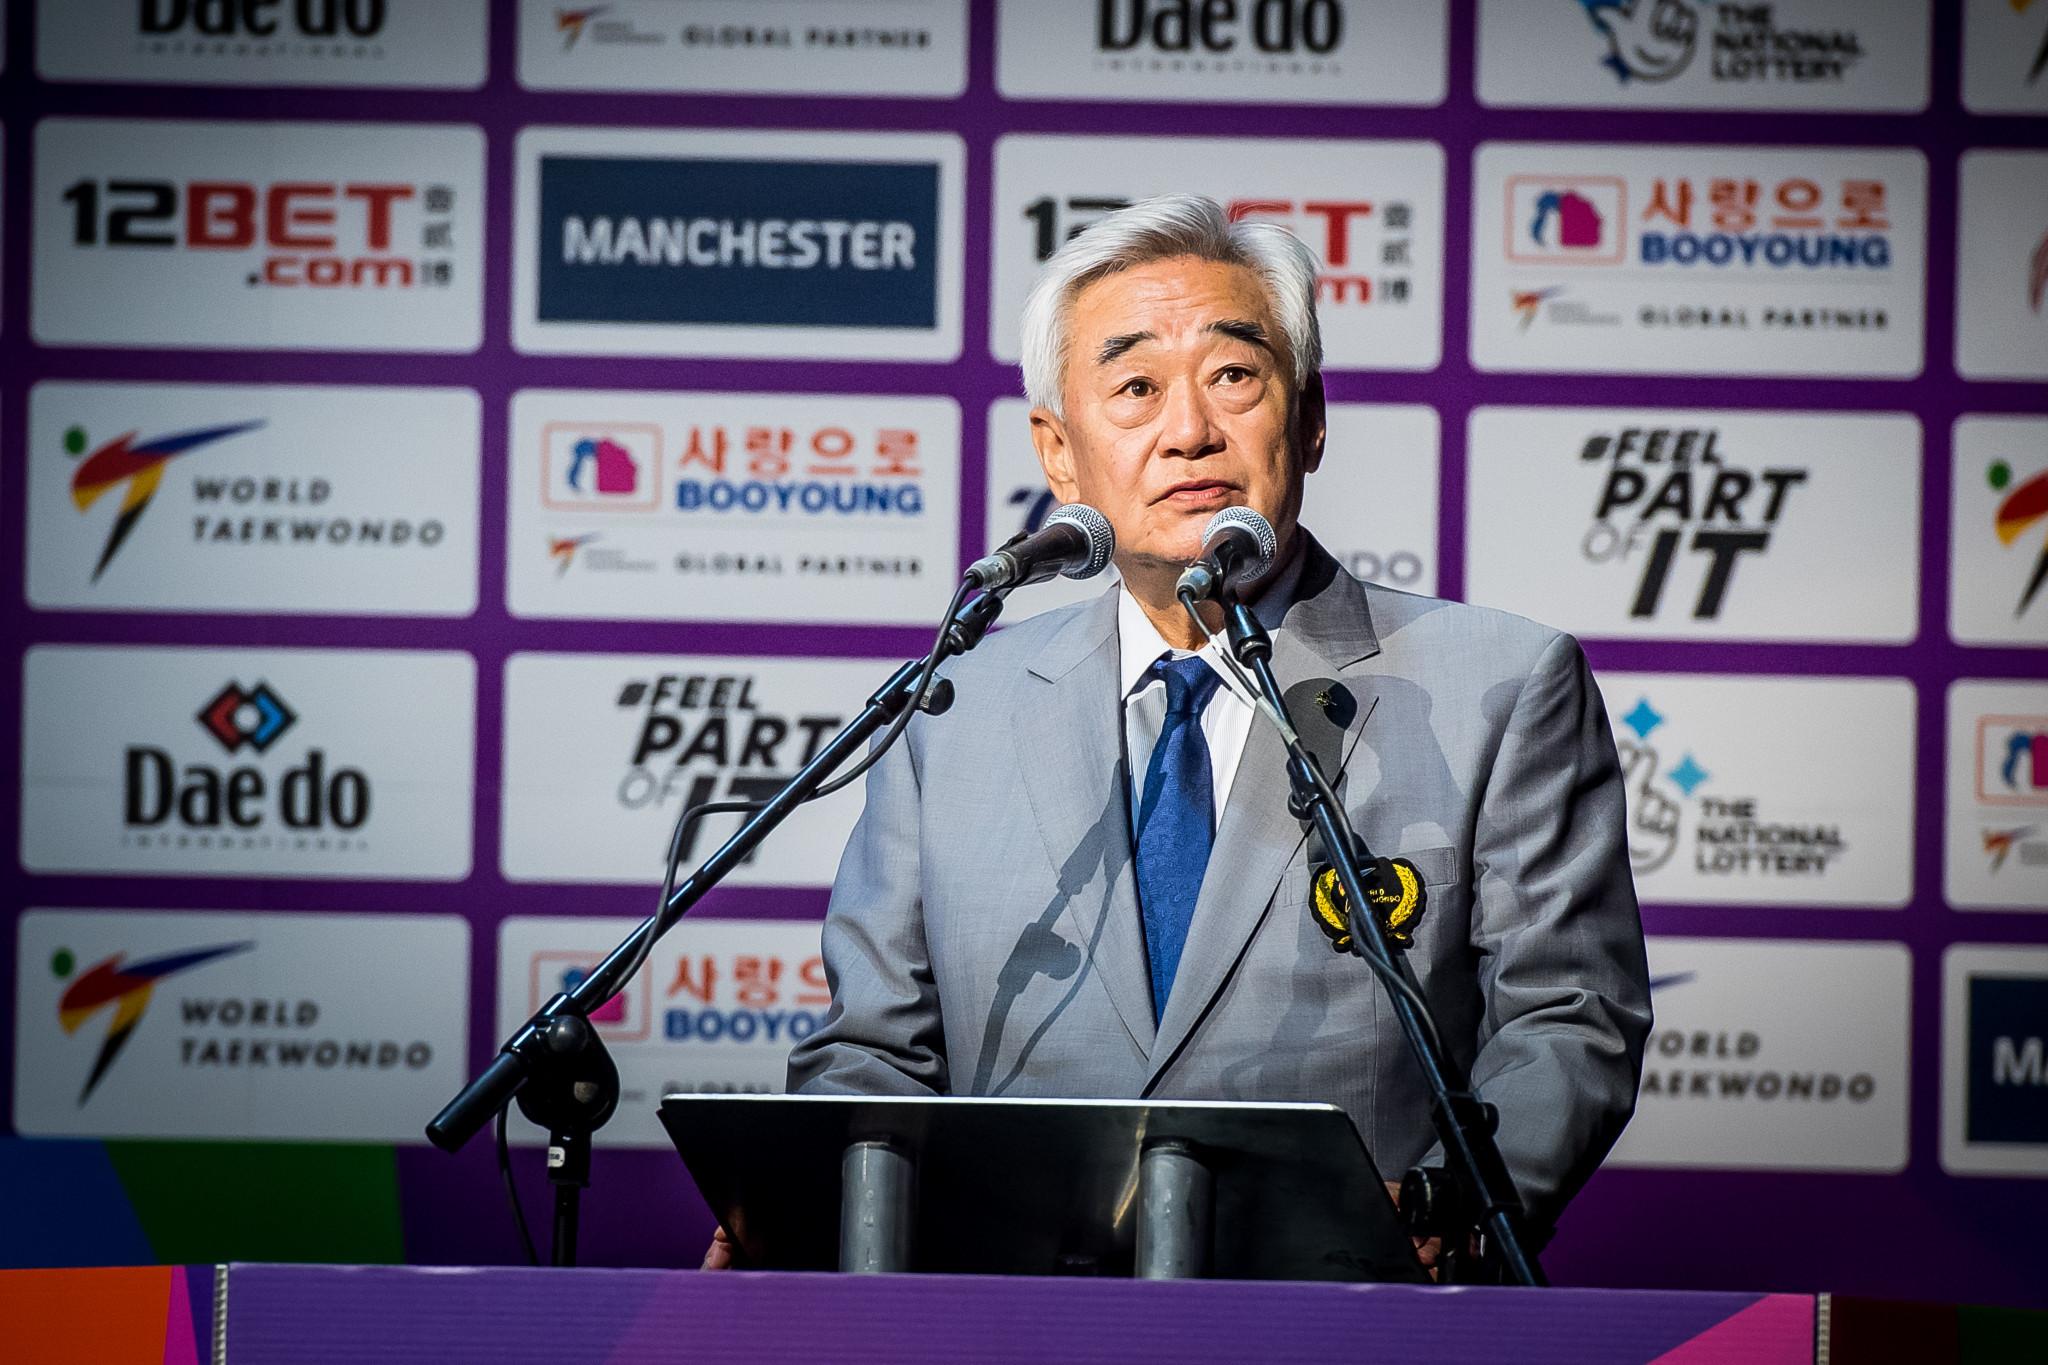 "World Taekwondo President Choue Chung-won said the World Championships would smooth out ""malfunctions"" for Tokyo 2020 ©World Taekwondo"